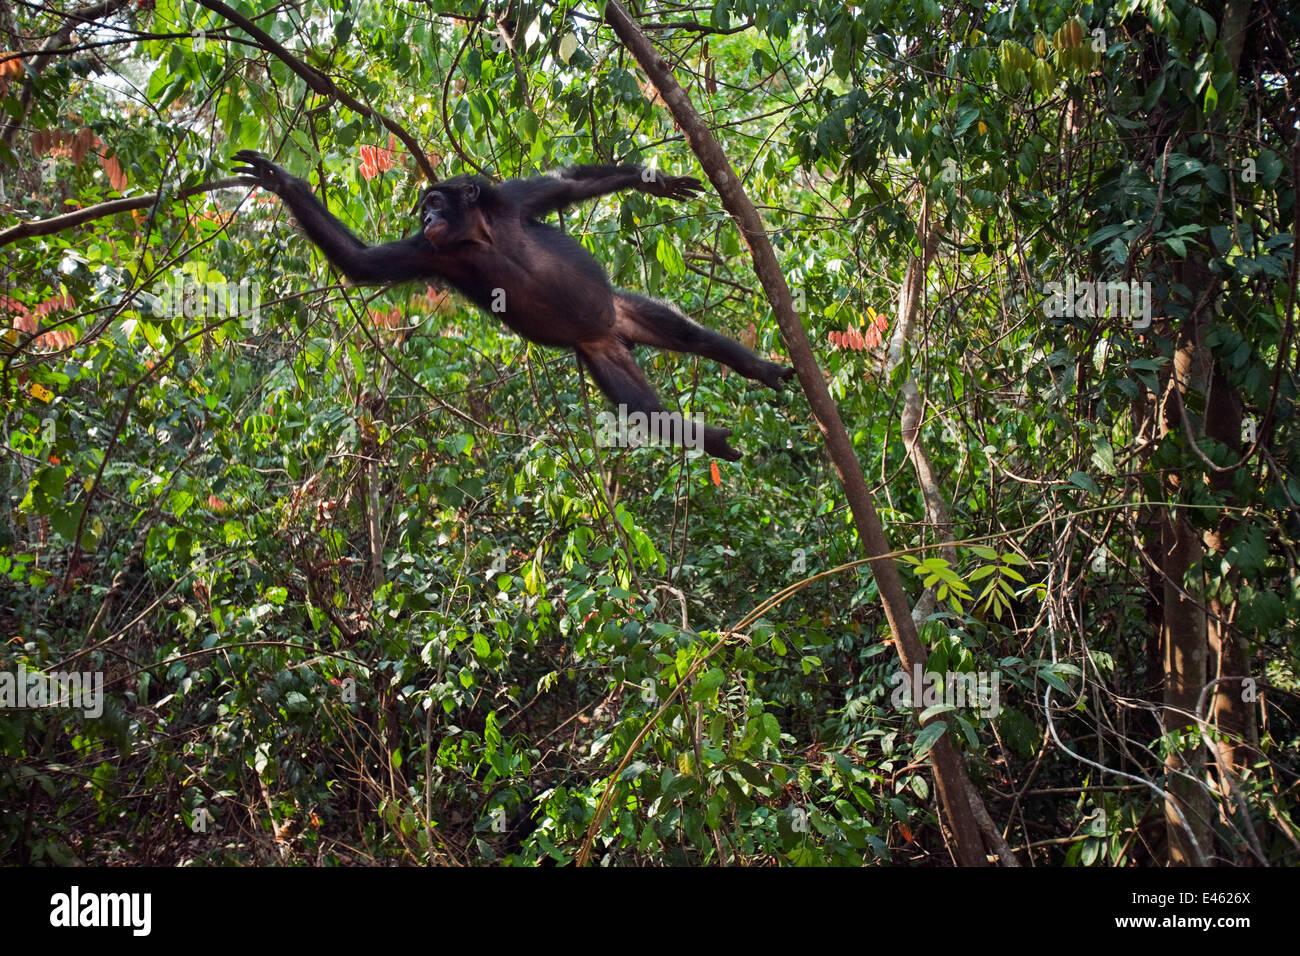 Bonobo (Pan paniscus) adolescent male leaping through the trees, Lola Ya Bonobo Sanctuary, Democratic Republic of - Stock Image